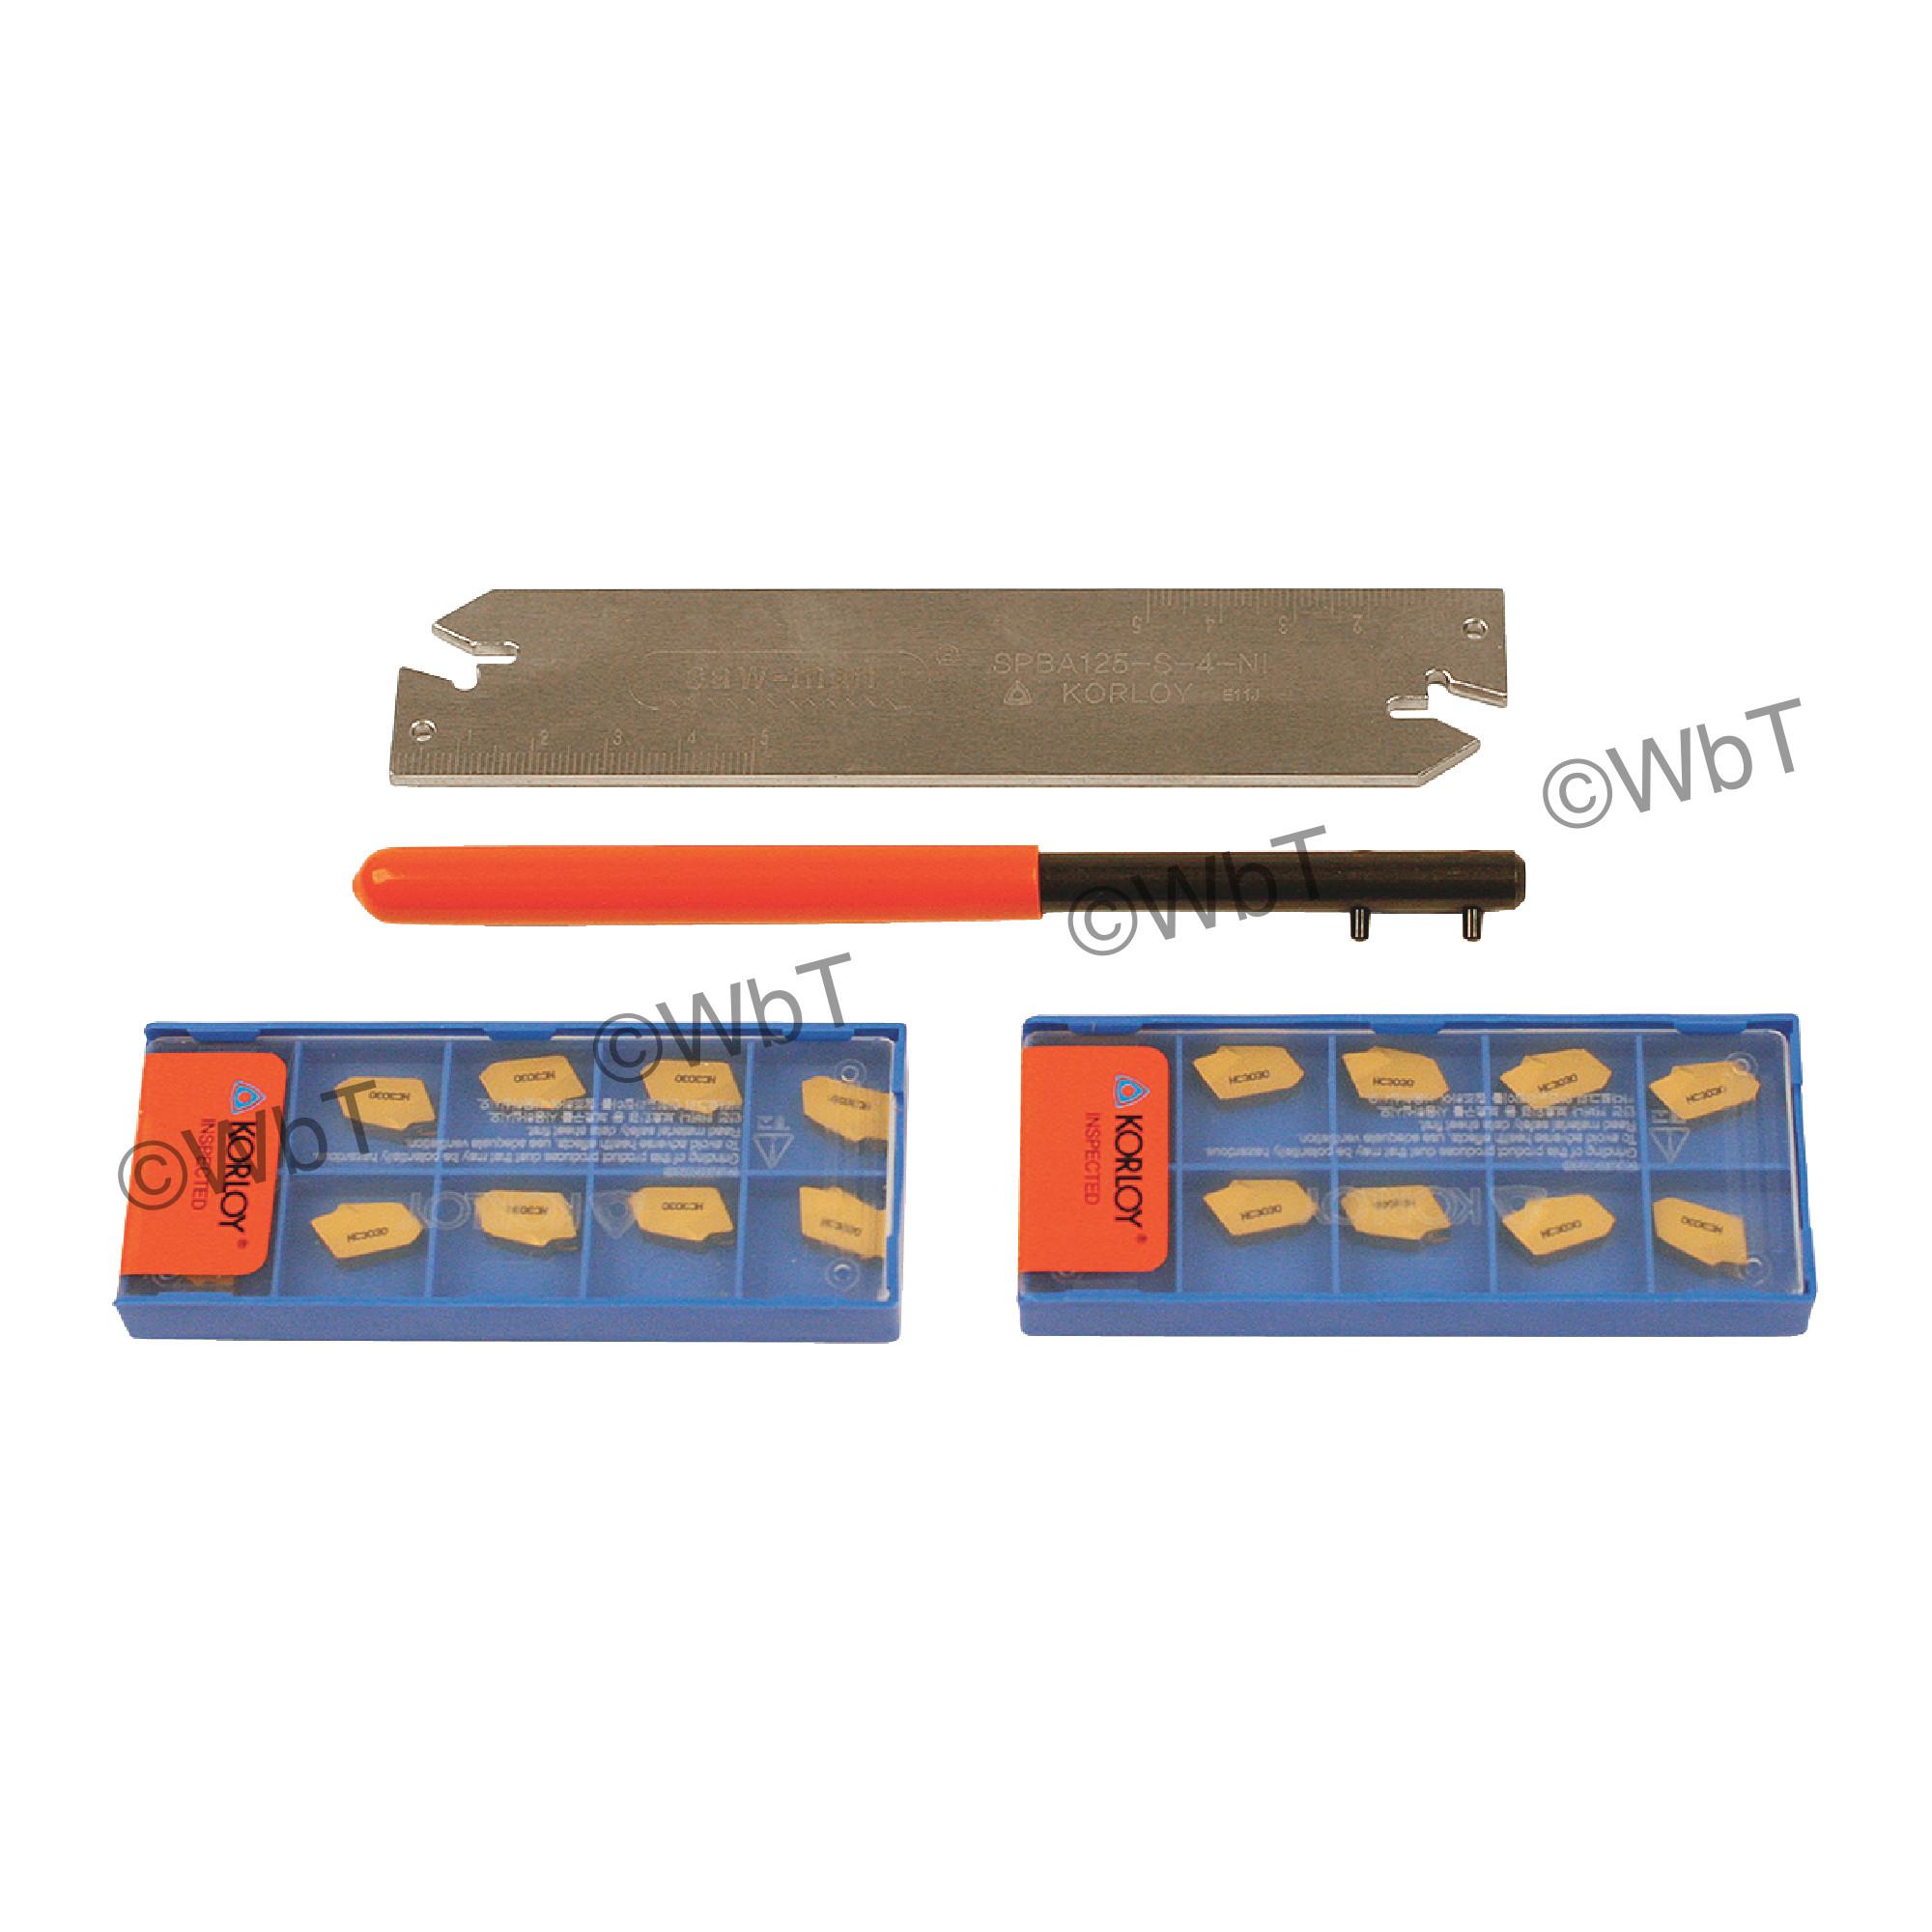 "KORLOY - SPBA125S3-KIT(P) / 1.25"" Parting Blade Set / With (20) GTN-3 NC3030 Coated Inserts / NEUTRAL"